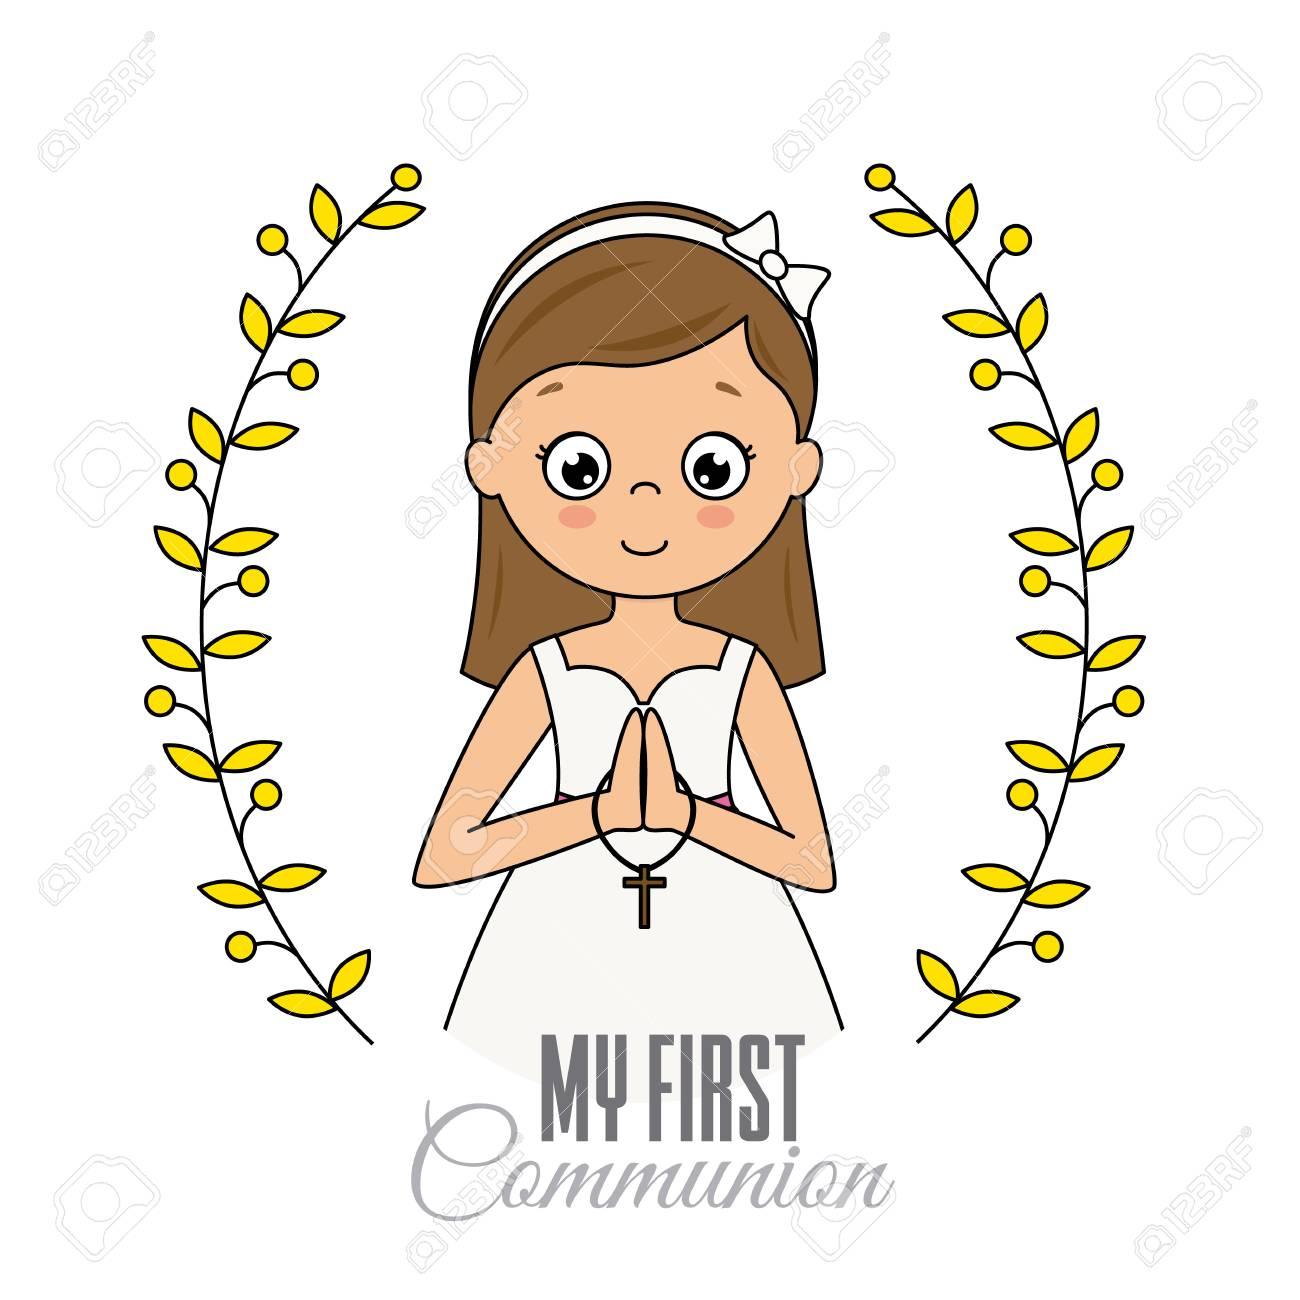 my first communion girl. Praying girl - 107989315